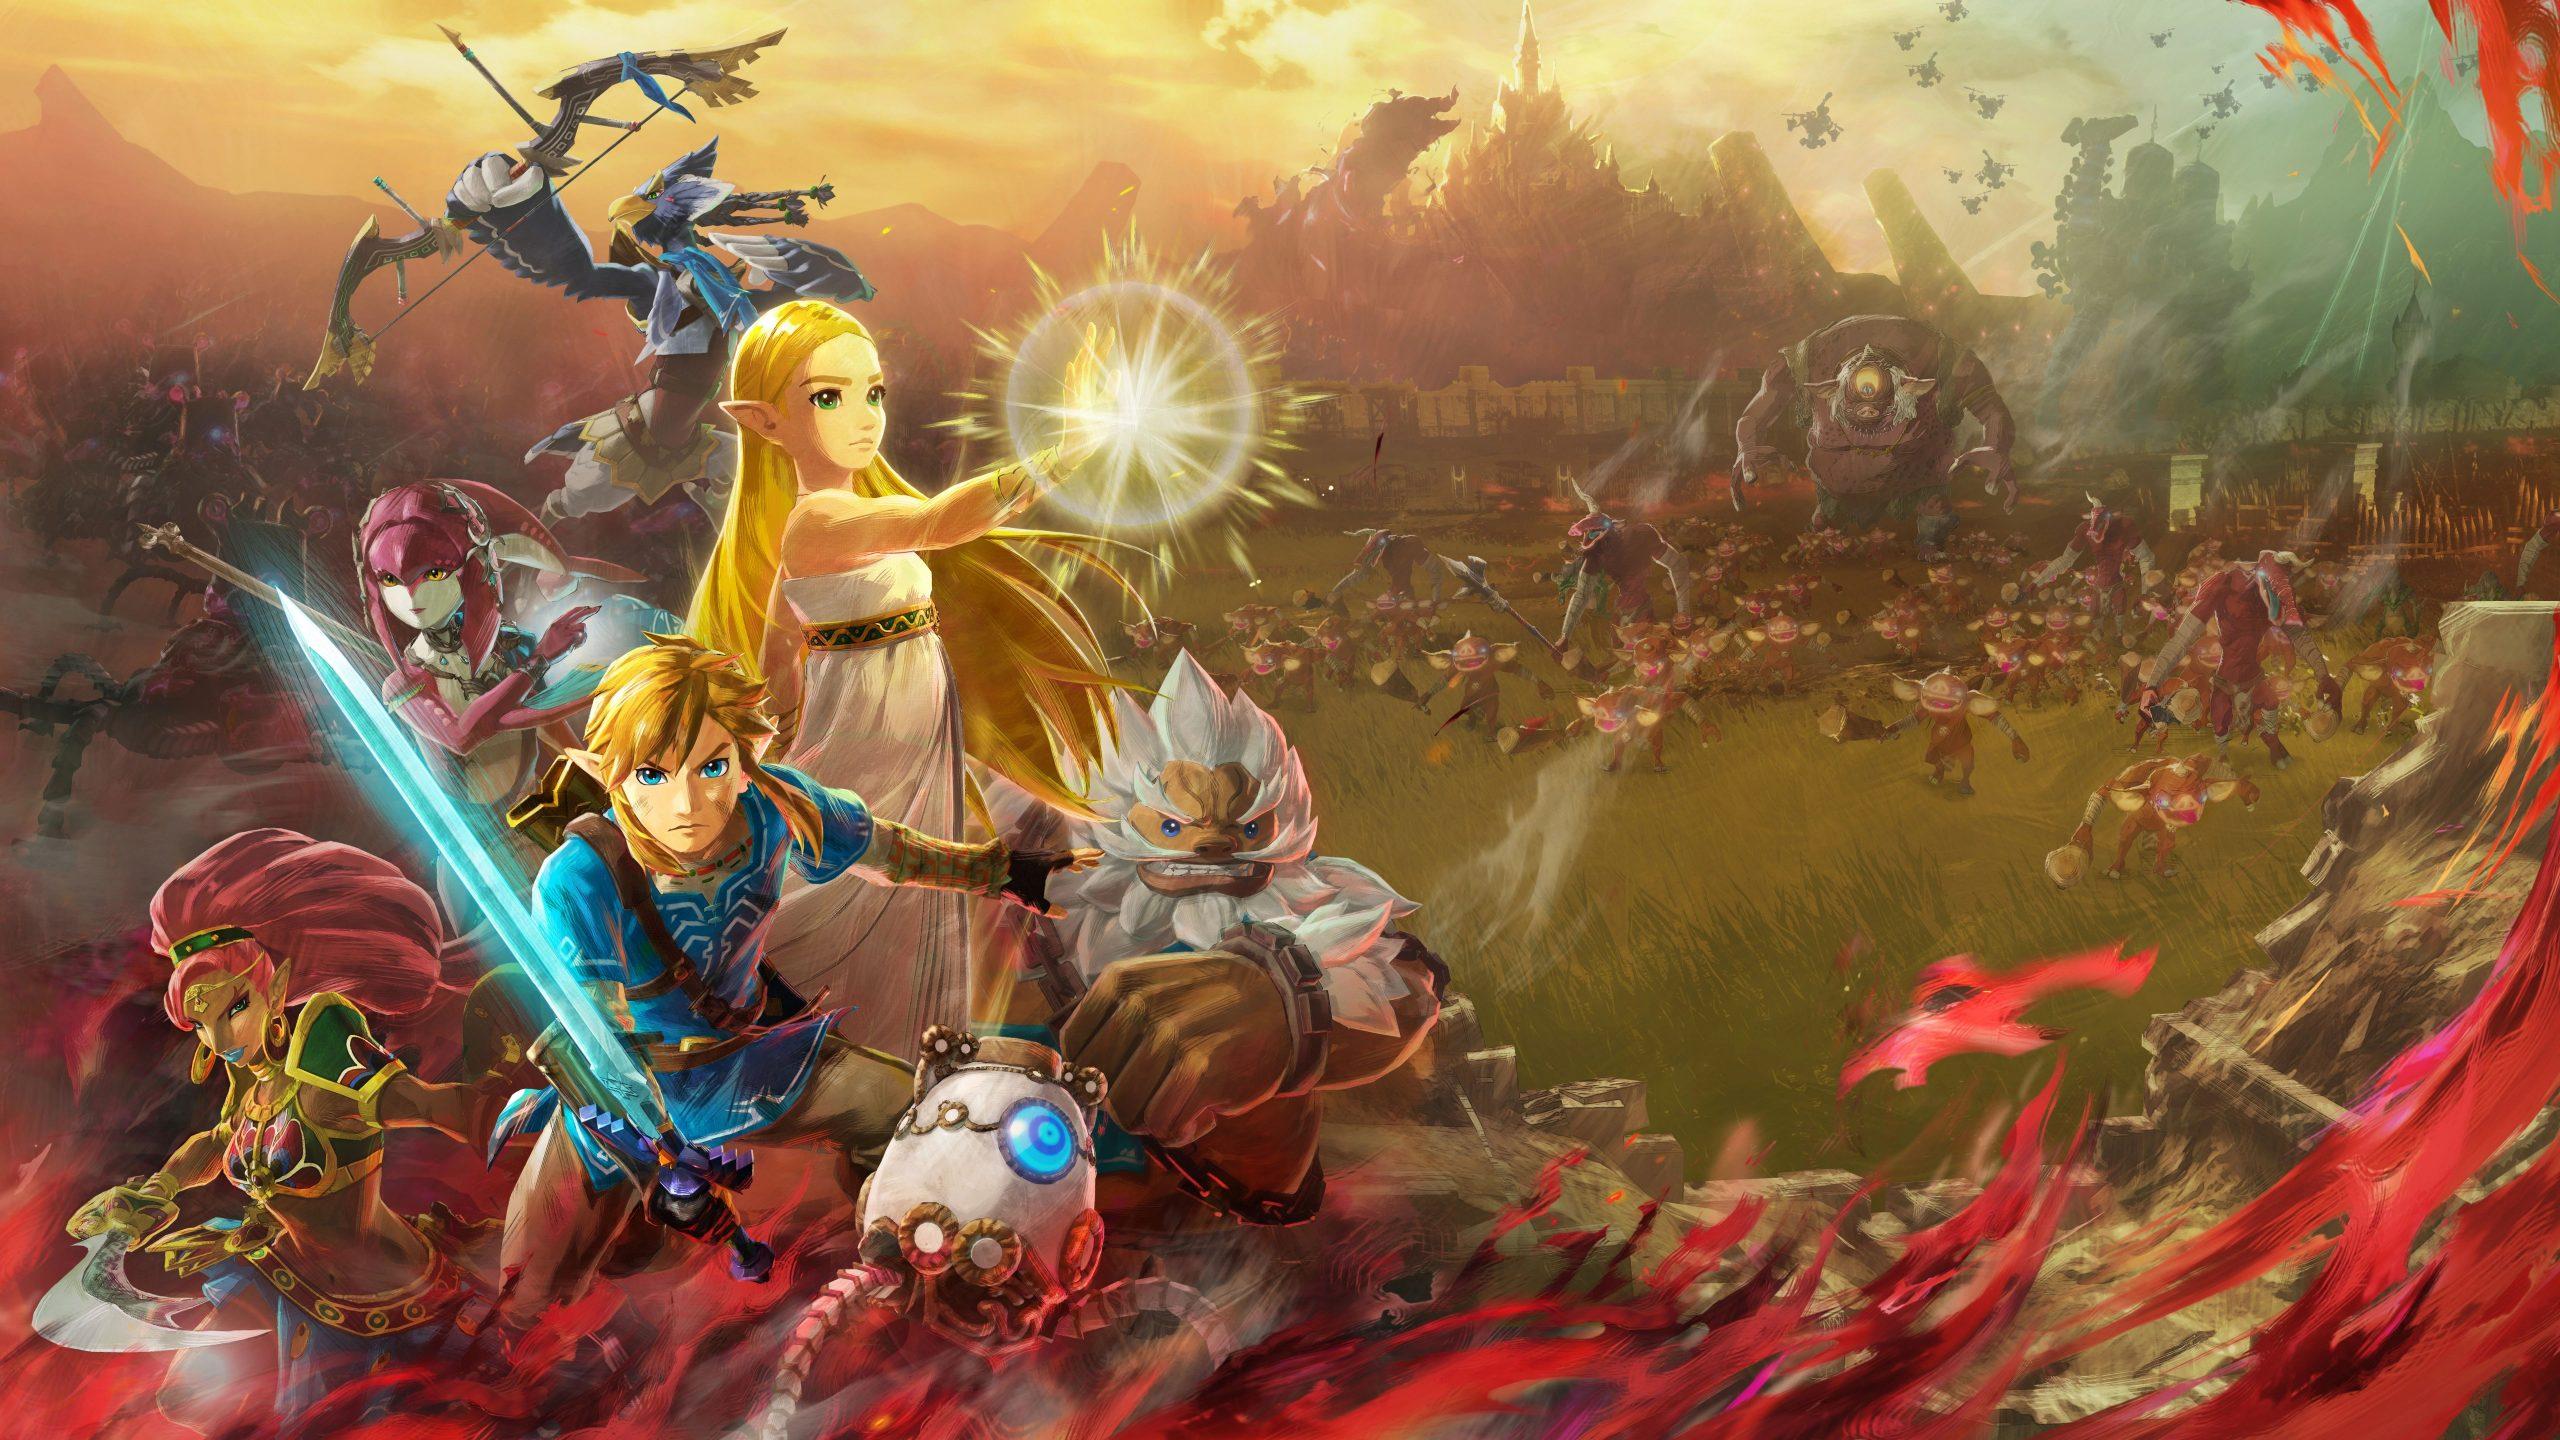 Hyrule Warriors: Age of Calamity Artwork